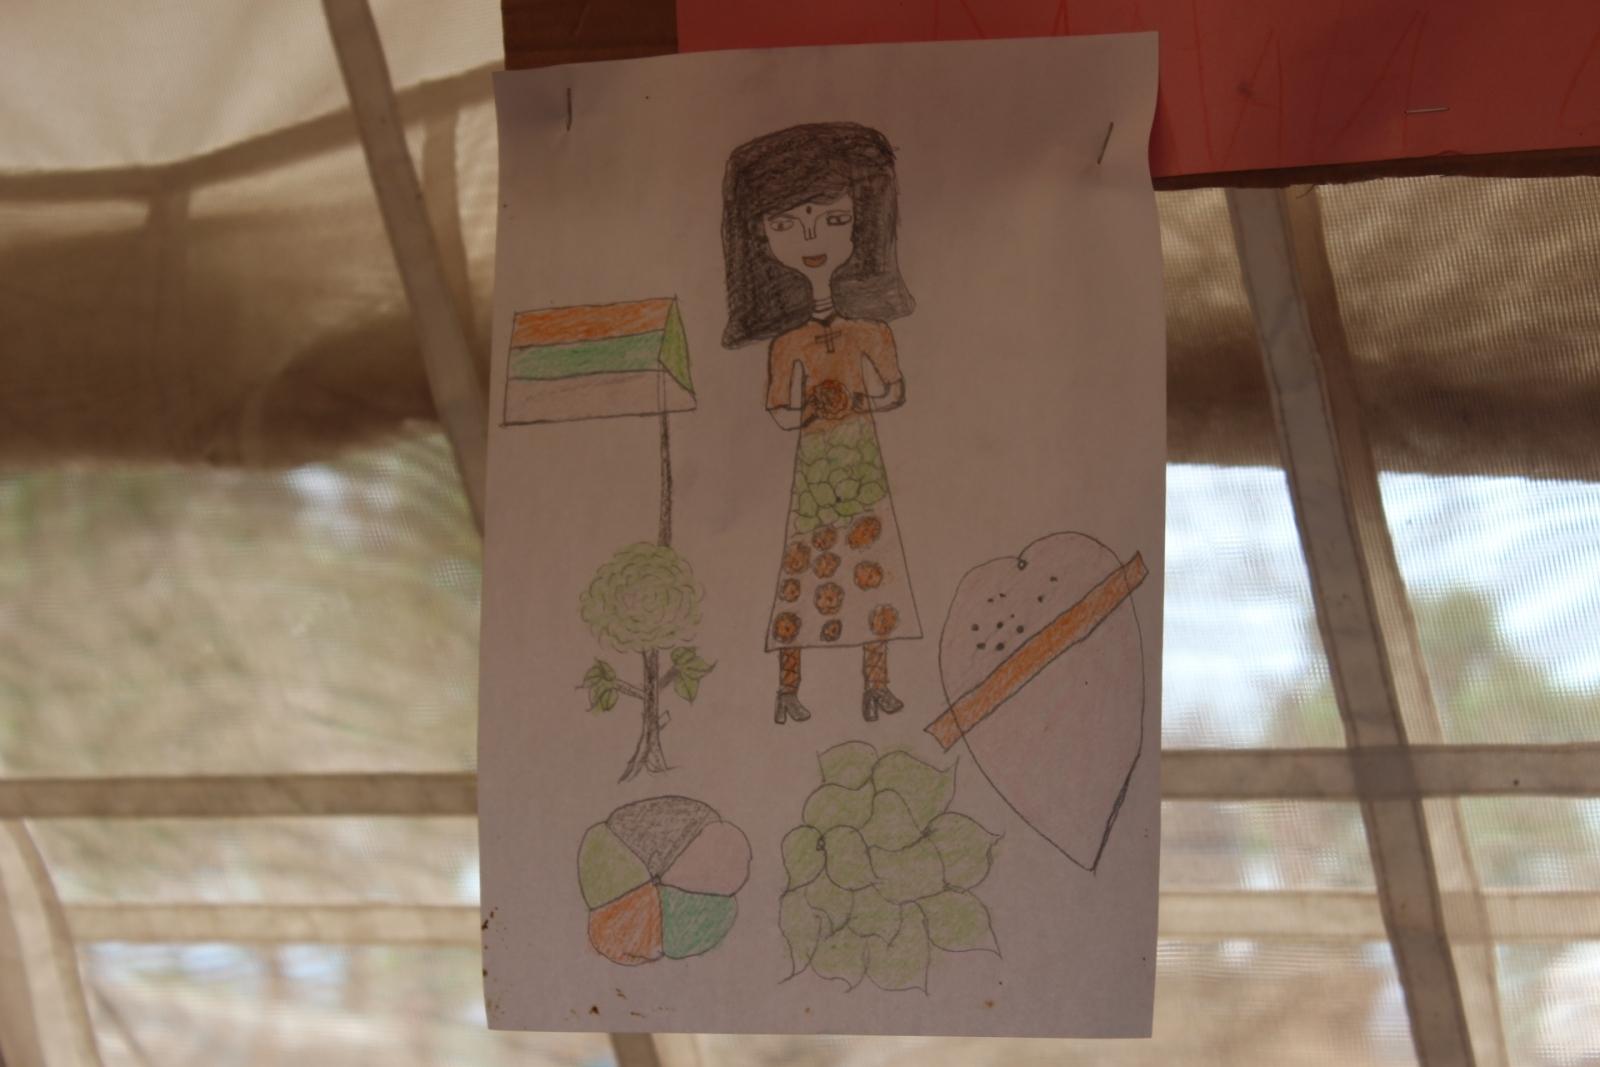 South Sudan children's drawings